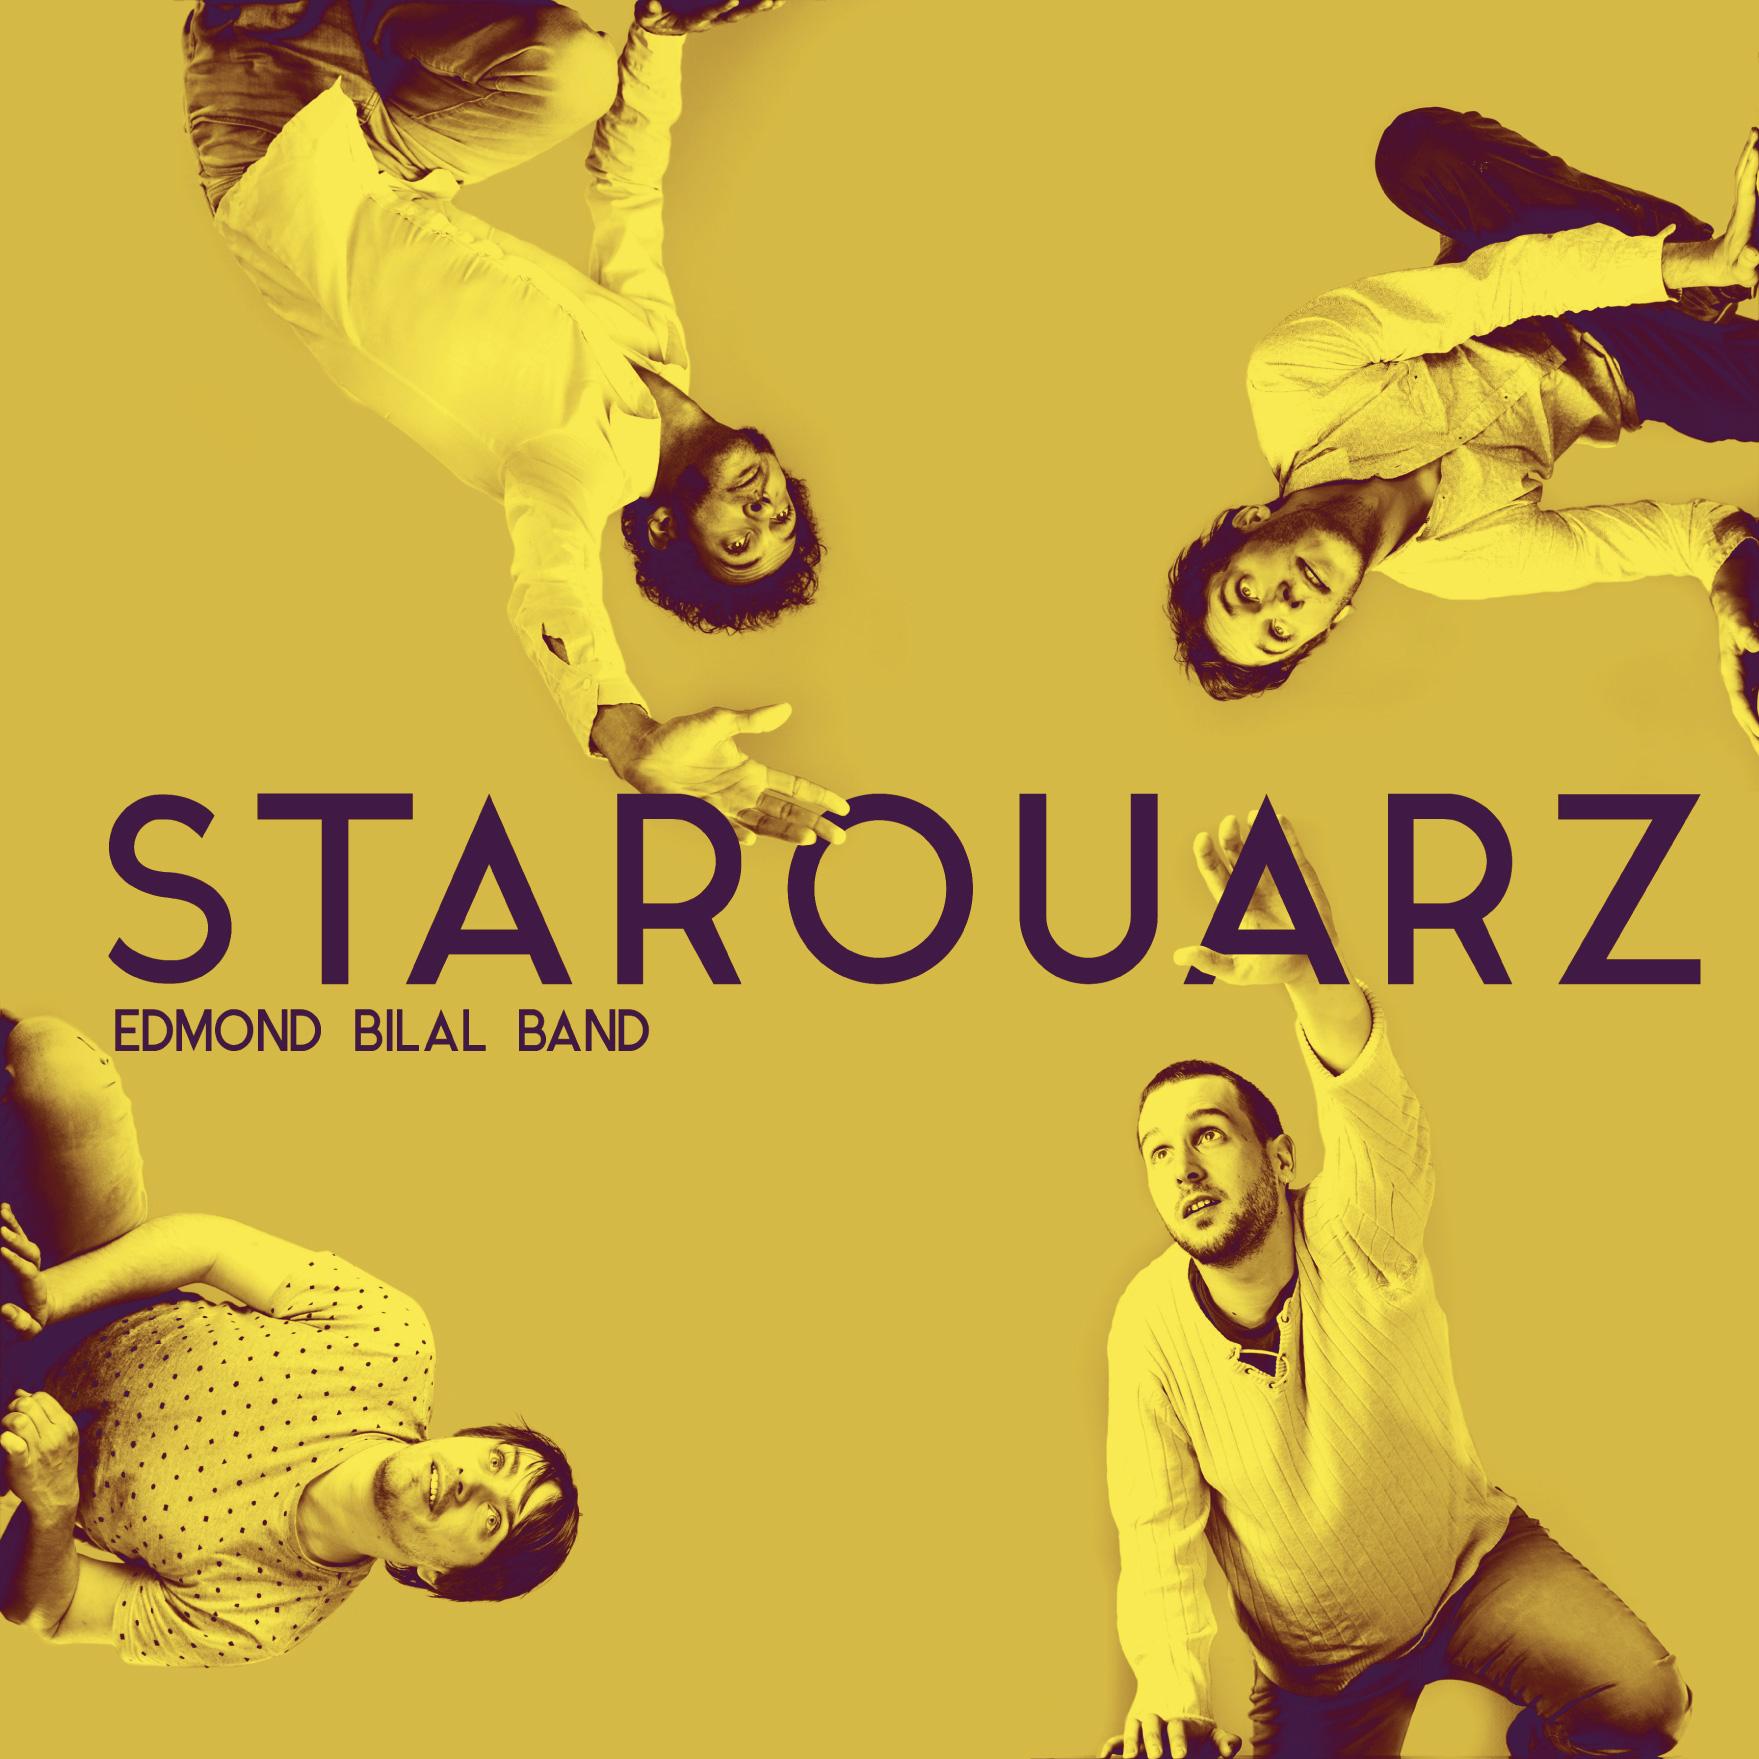 Starouarz – La force est avec Edmond Bilal Band